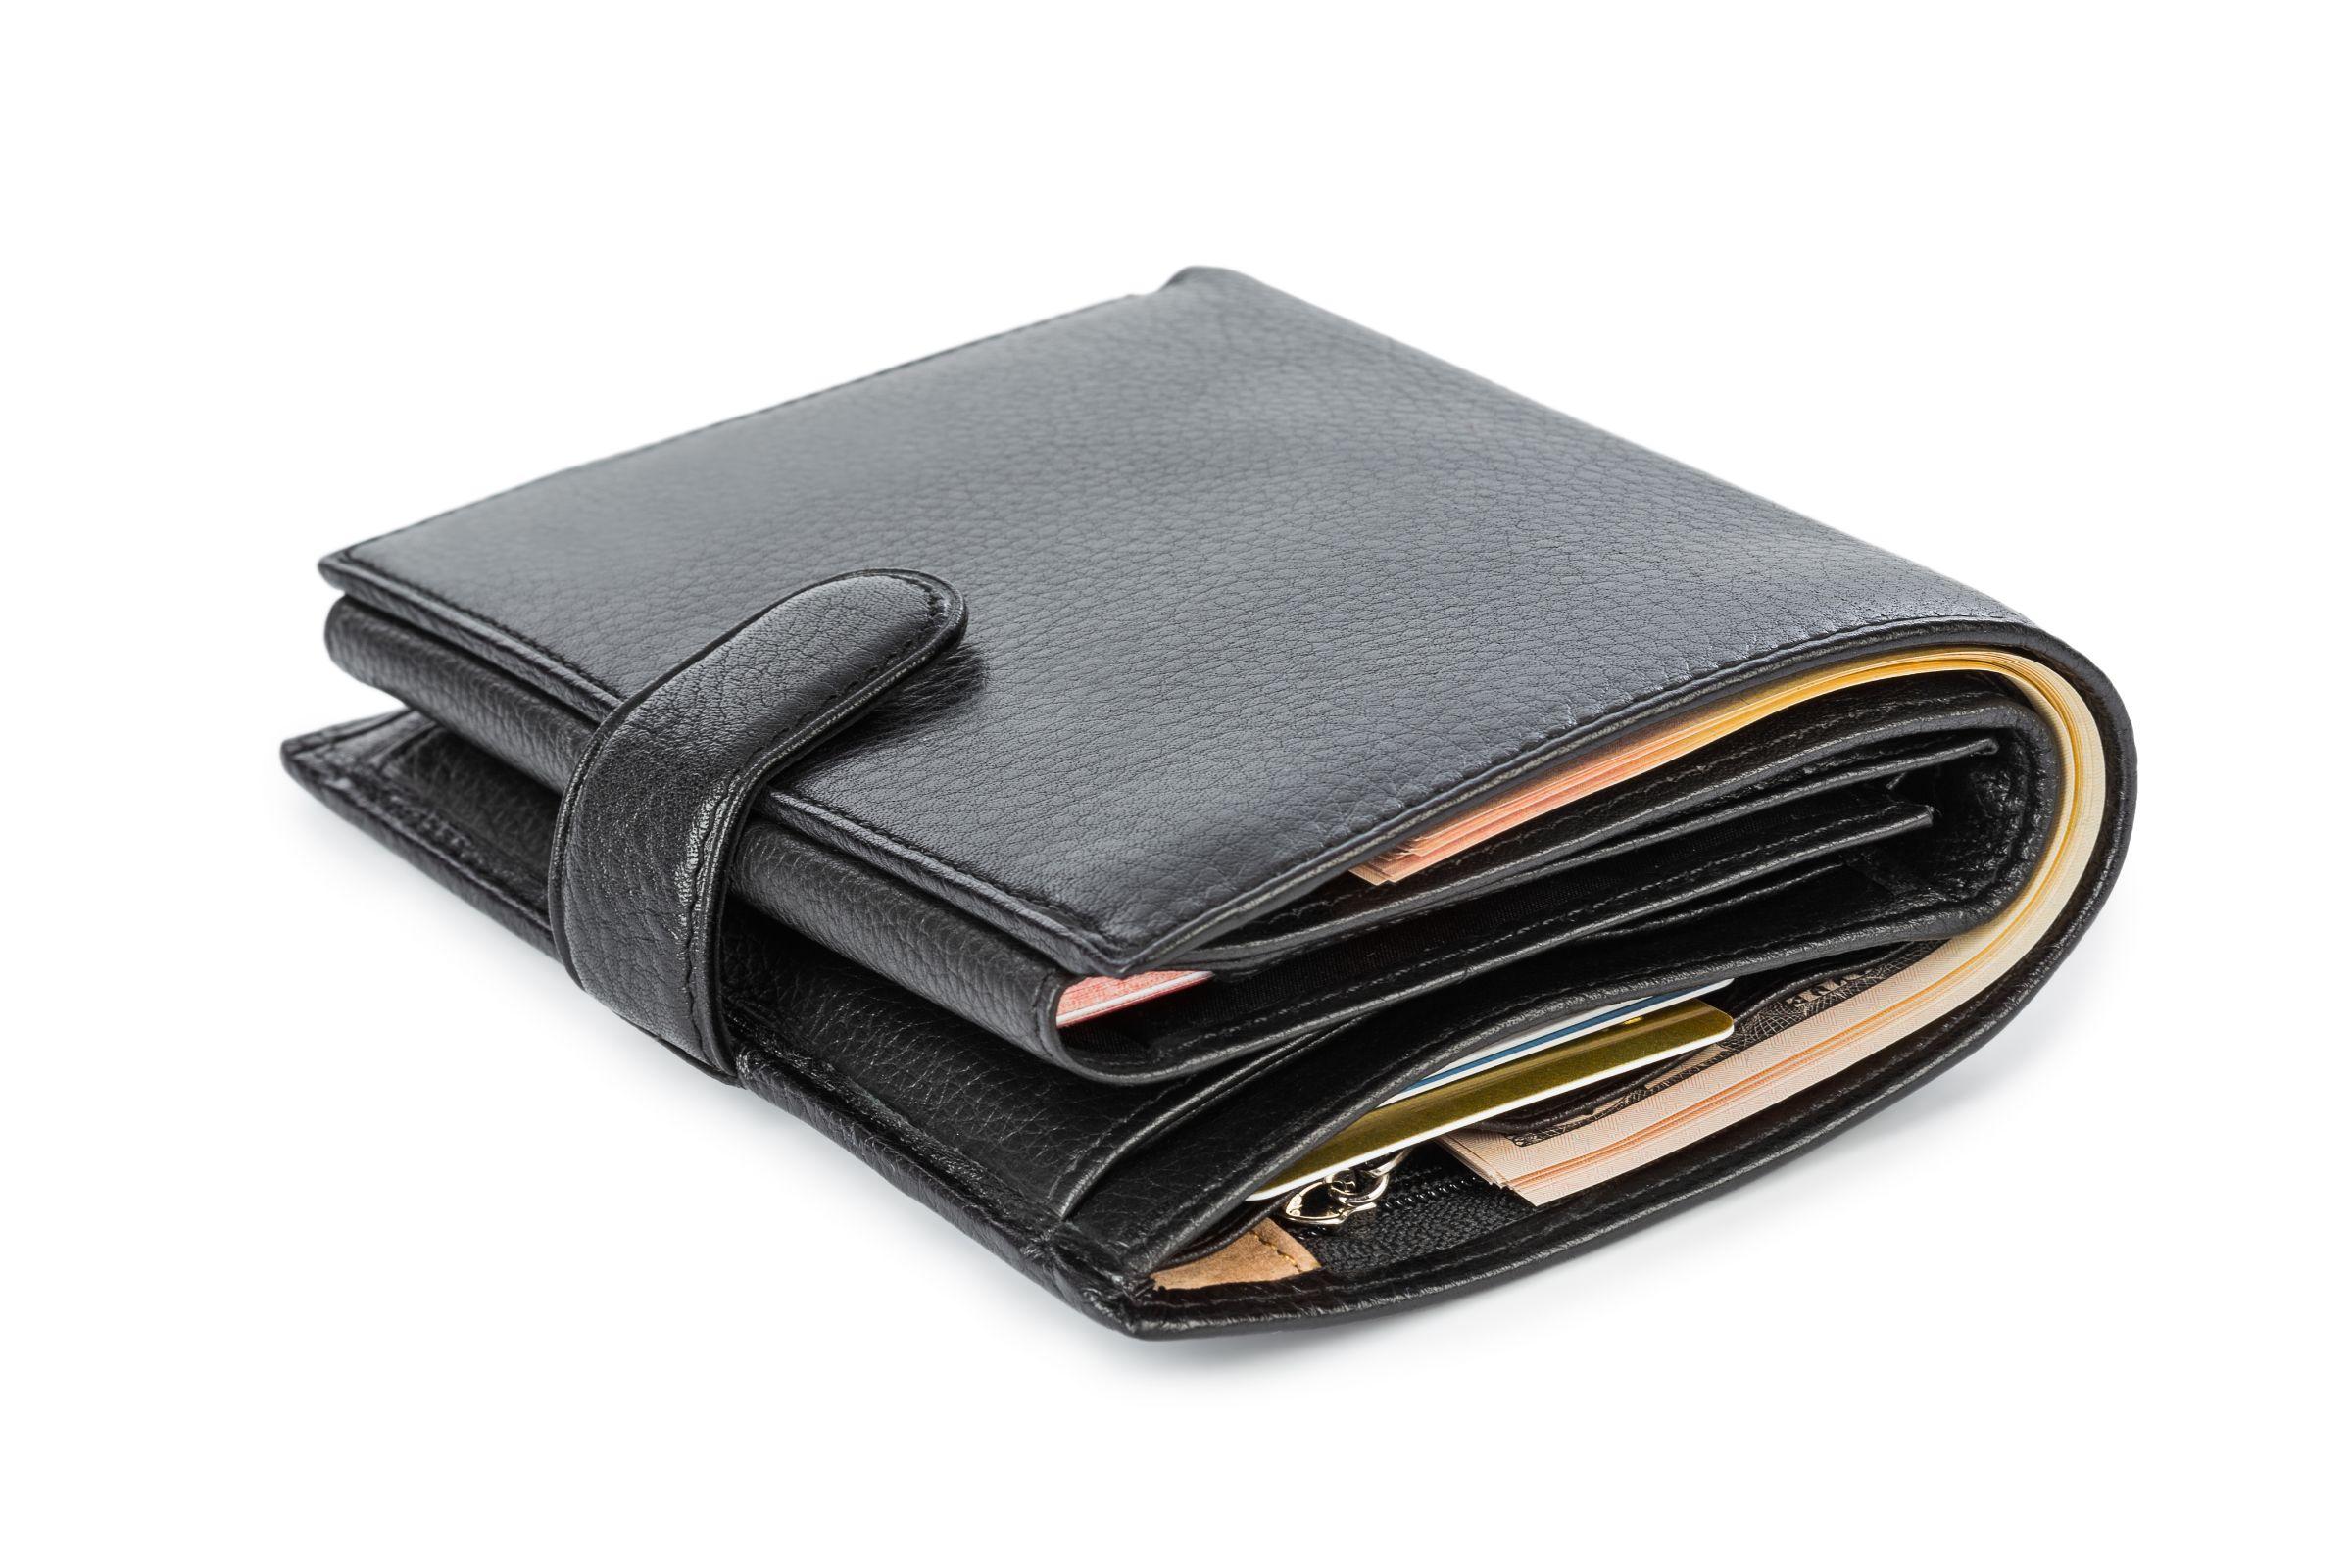 Segundo ortopedistas, carteira no bolso pode provocar dor no quadril